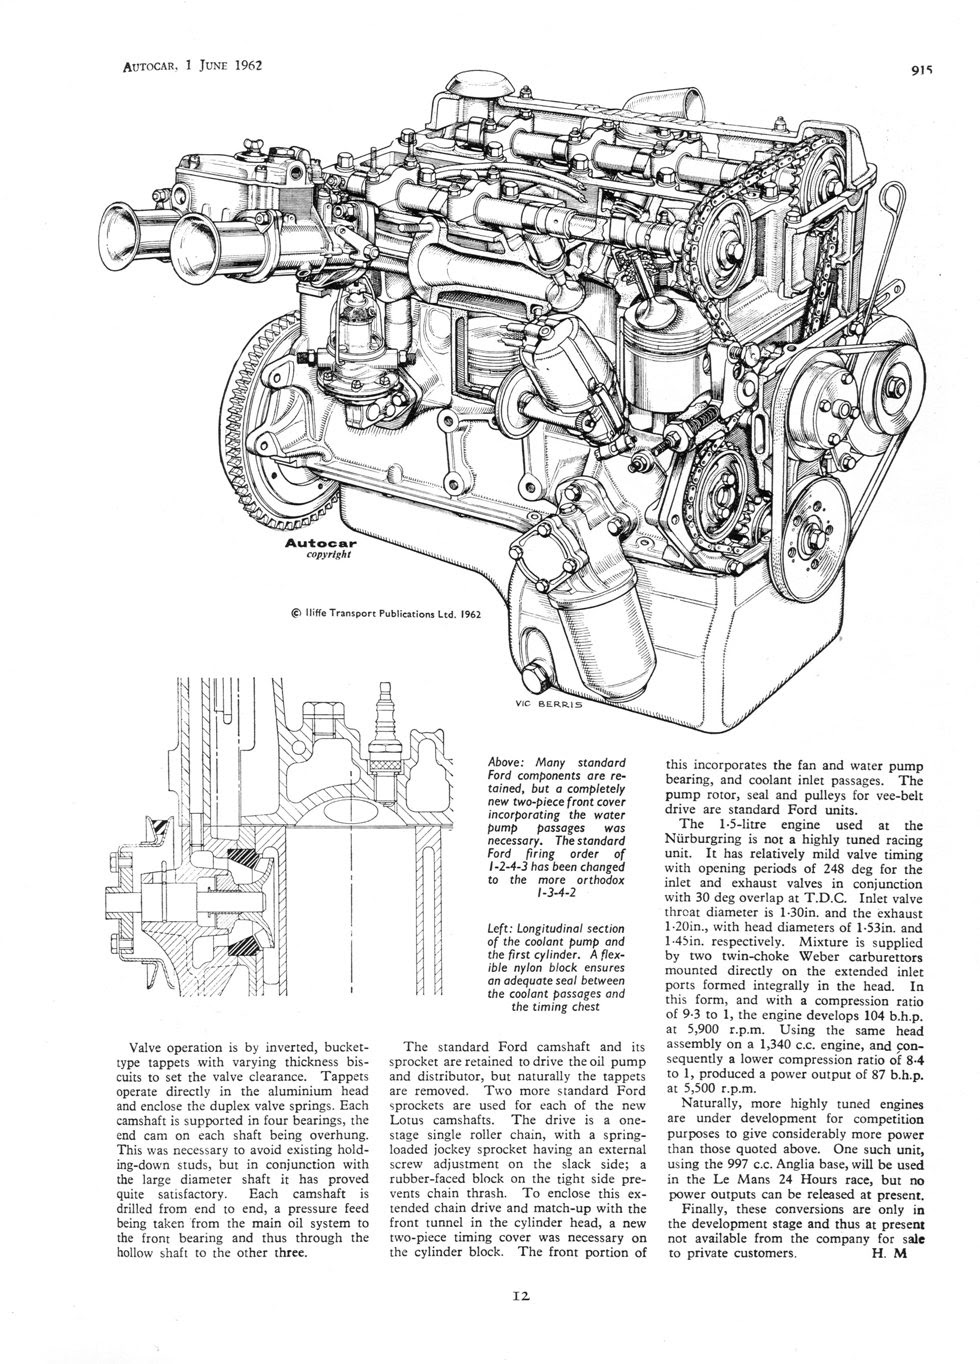 Chevy 2 4 Liter Twin Cam Engine Diagram - Wiring Database Rotation  rush-depart - rush-depart.ciaodiscotecaitaliana.it | Chevy 2 4 Liter Twin Cam Engine Diagram |  | rush-depart.ciaodiscotecaitaliana.it